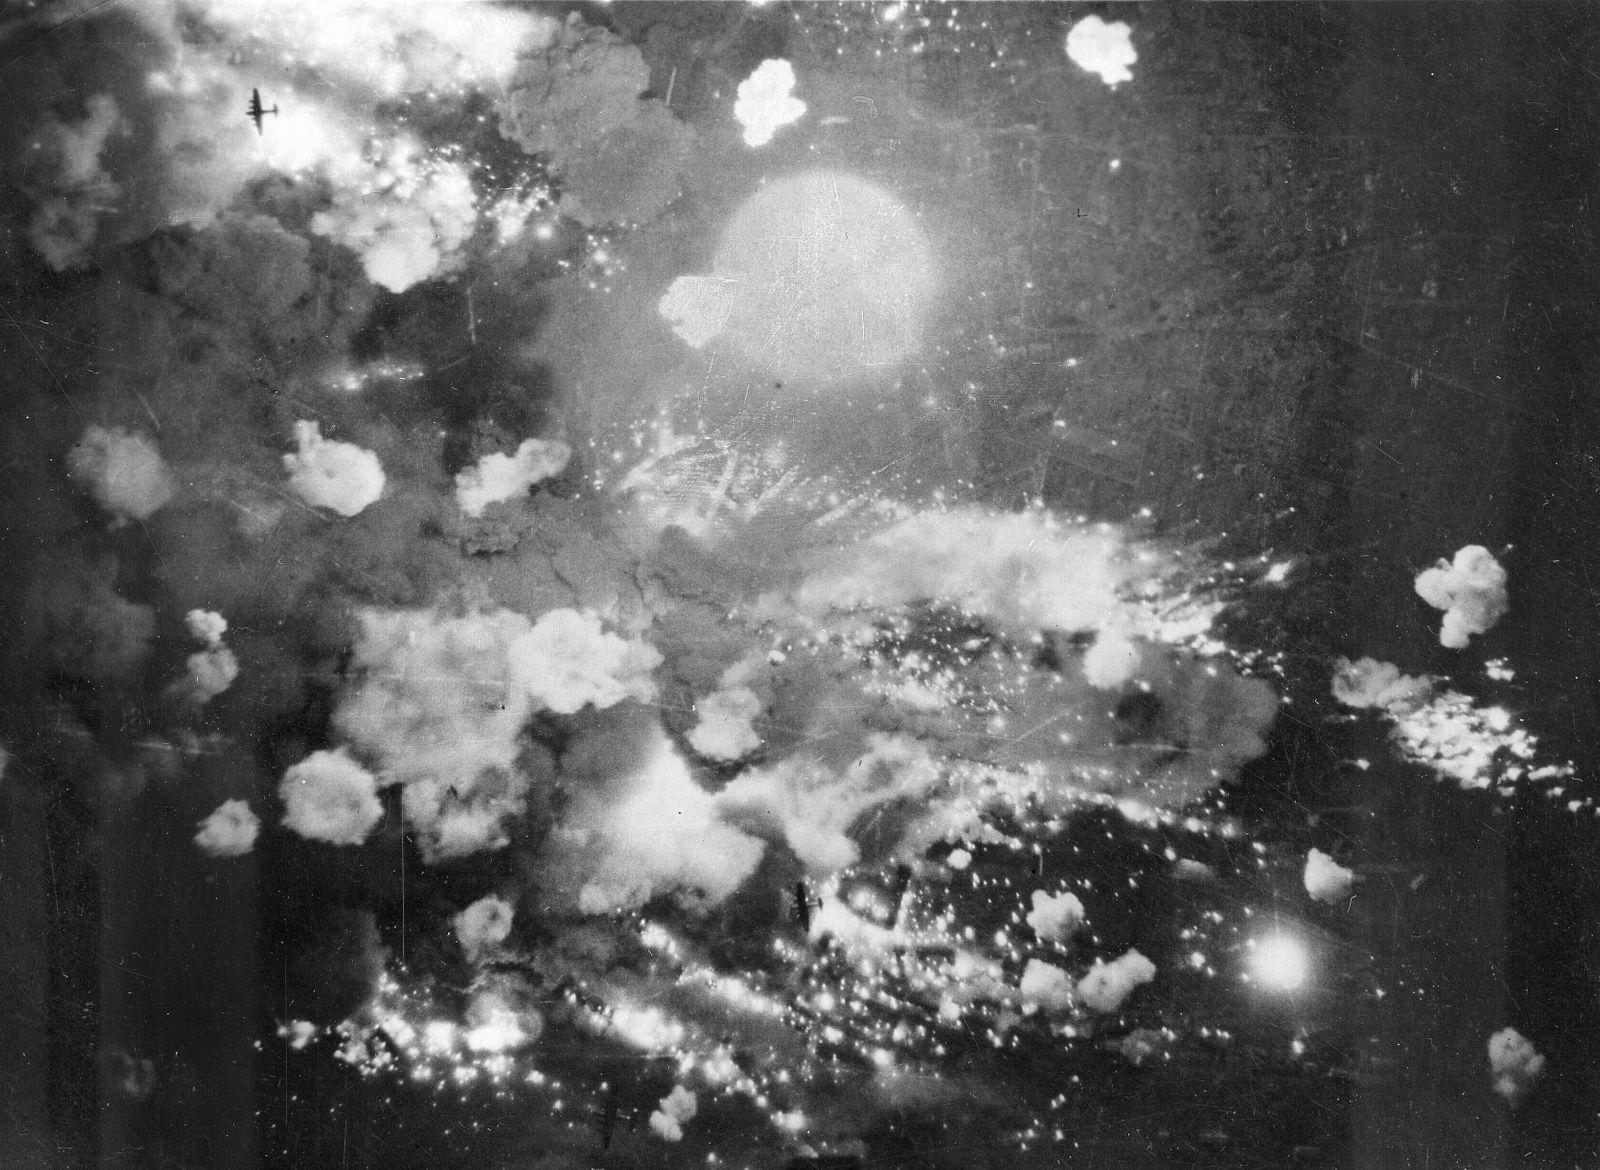 Pforzheim Bombardierung - WWII Germany